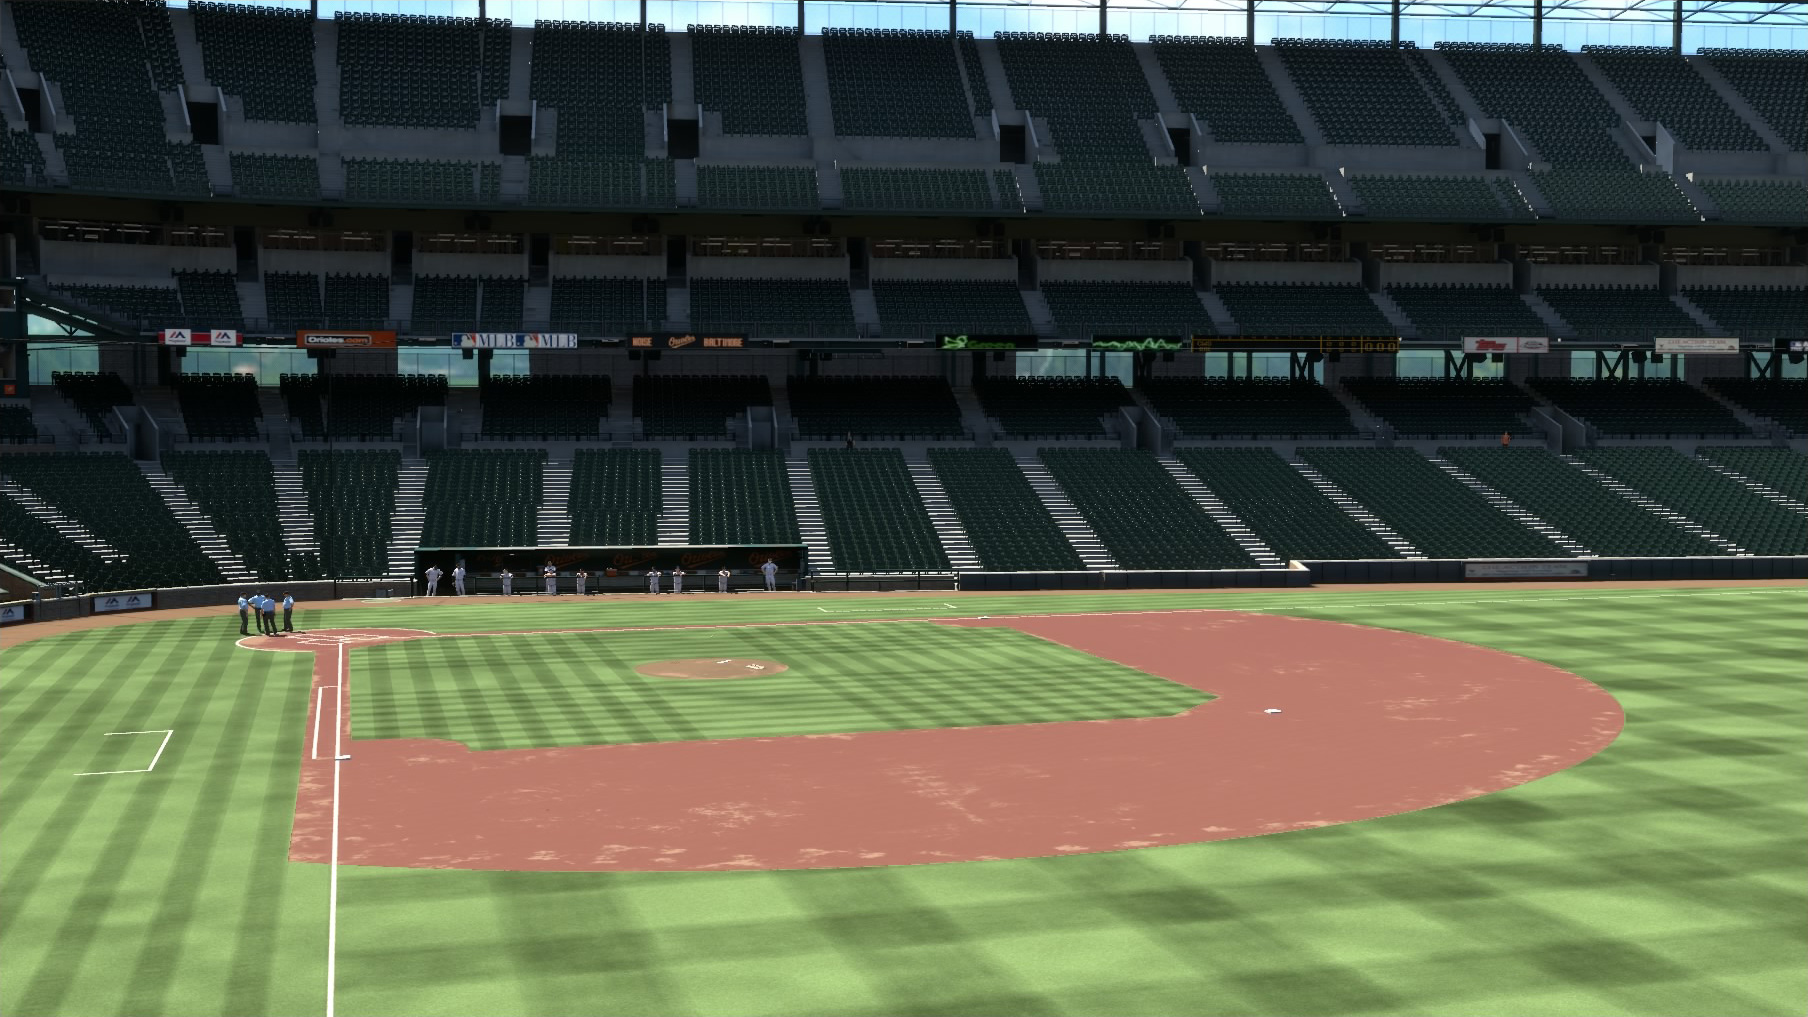 Mlb 15 The Show Recreates Historic Baltimore Orioles Game